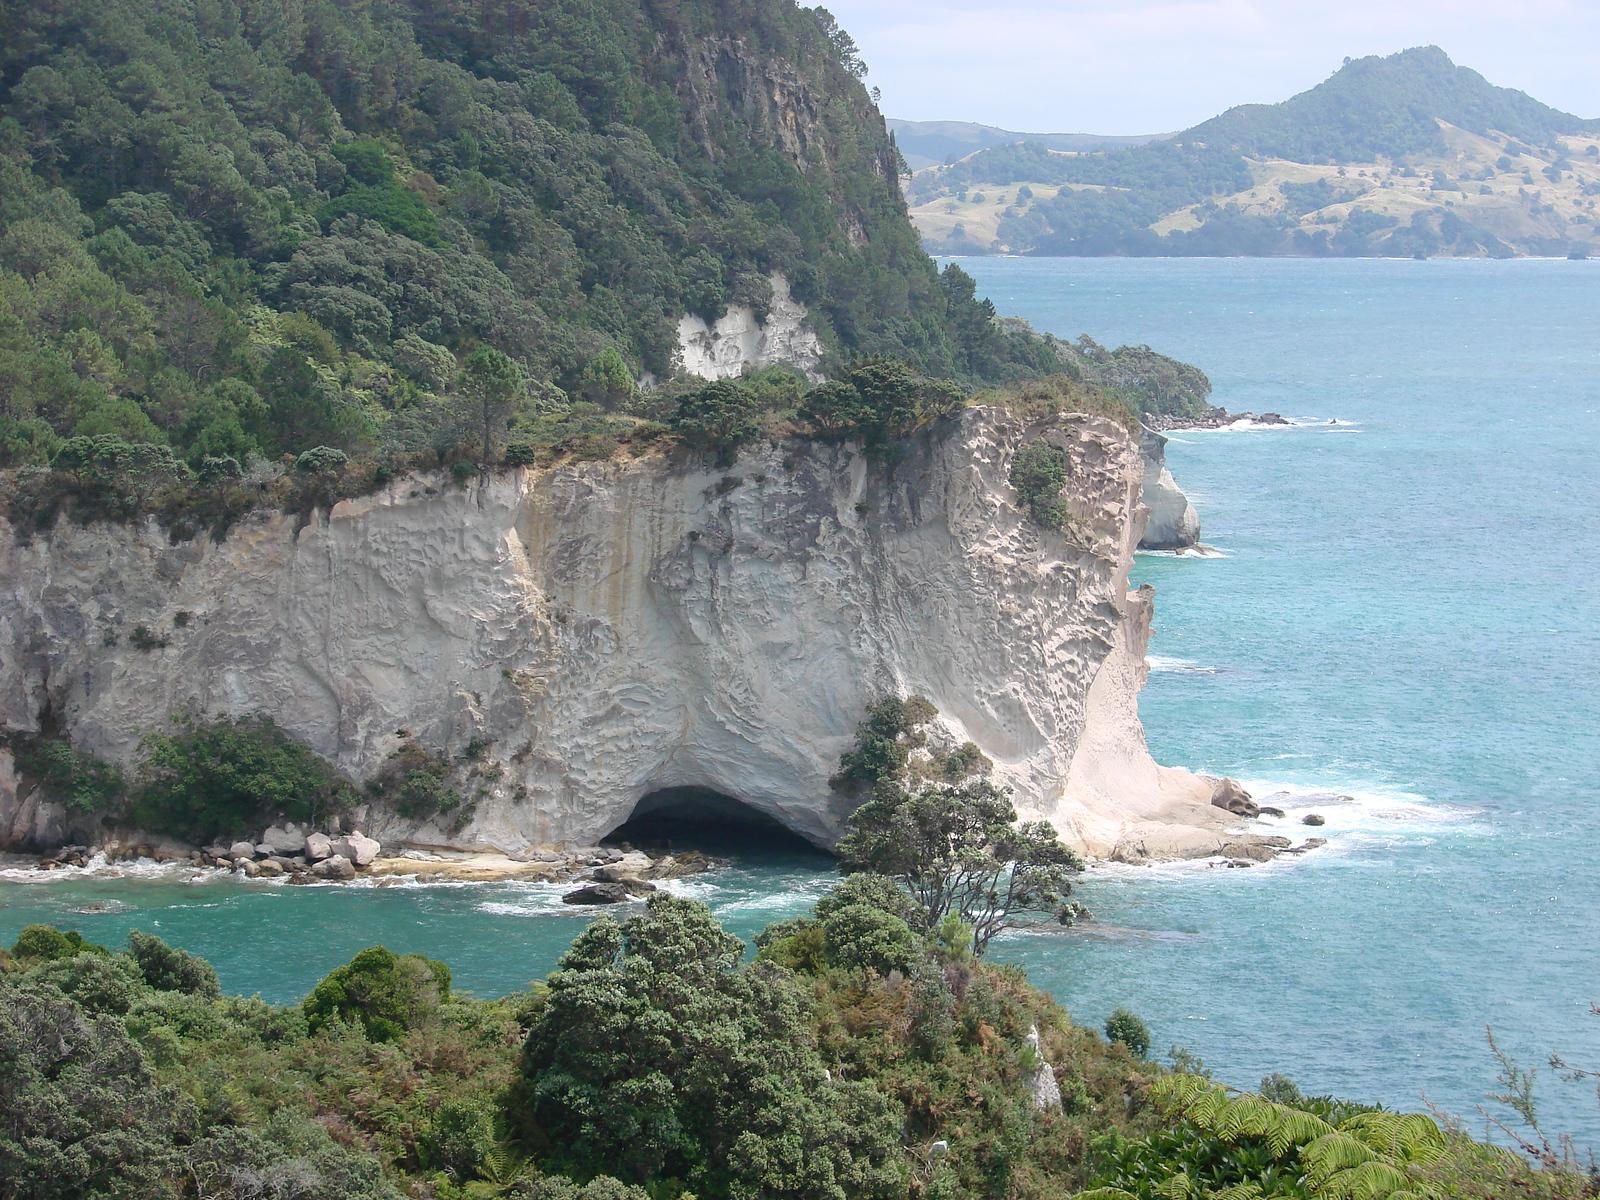 Coromandel Cliffs, New Zealand